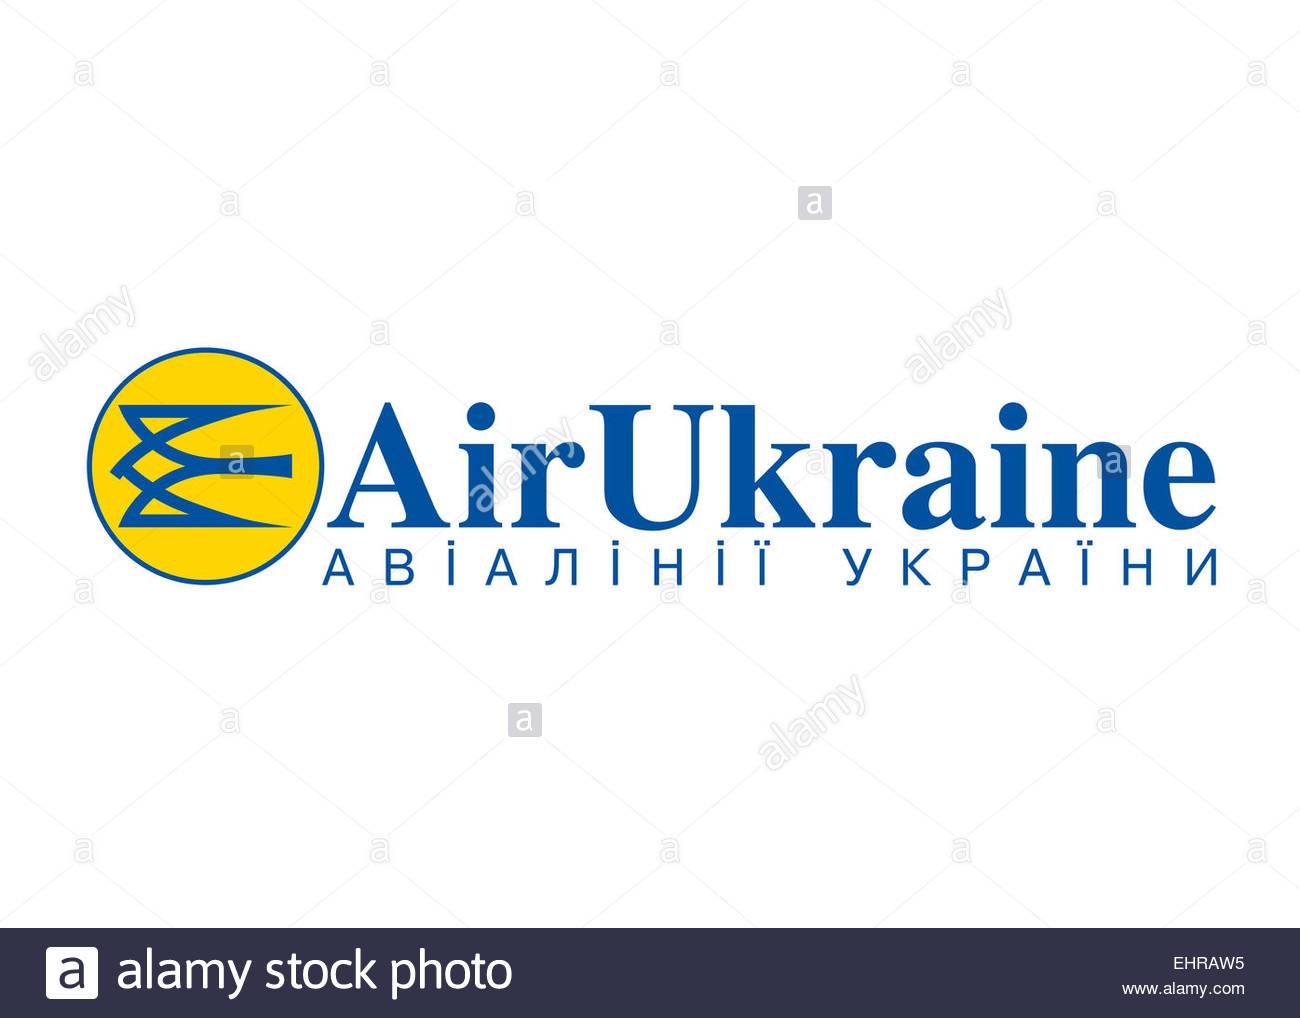 Air ucrania símbolo logotipo emblema distintivo Imagen De Stock